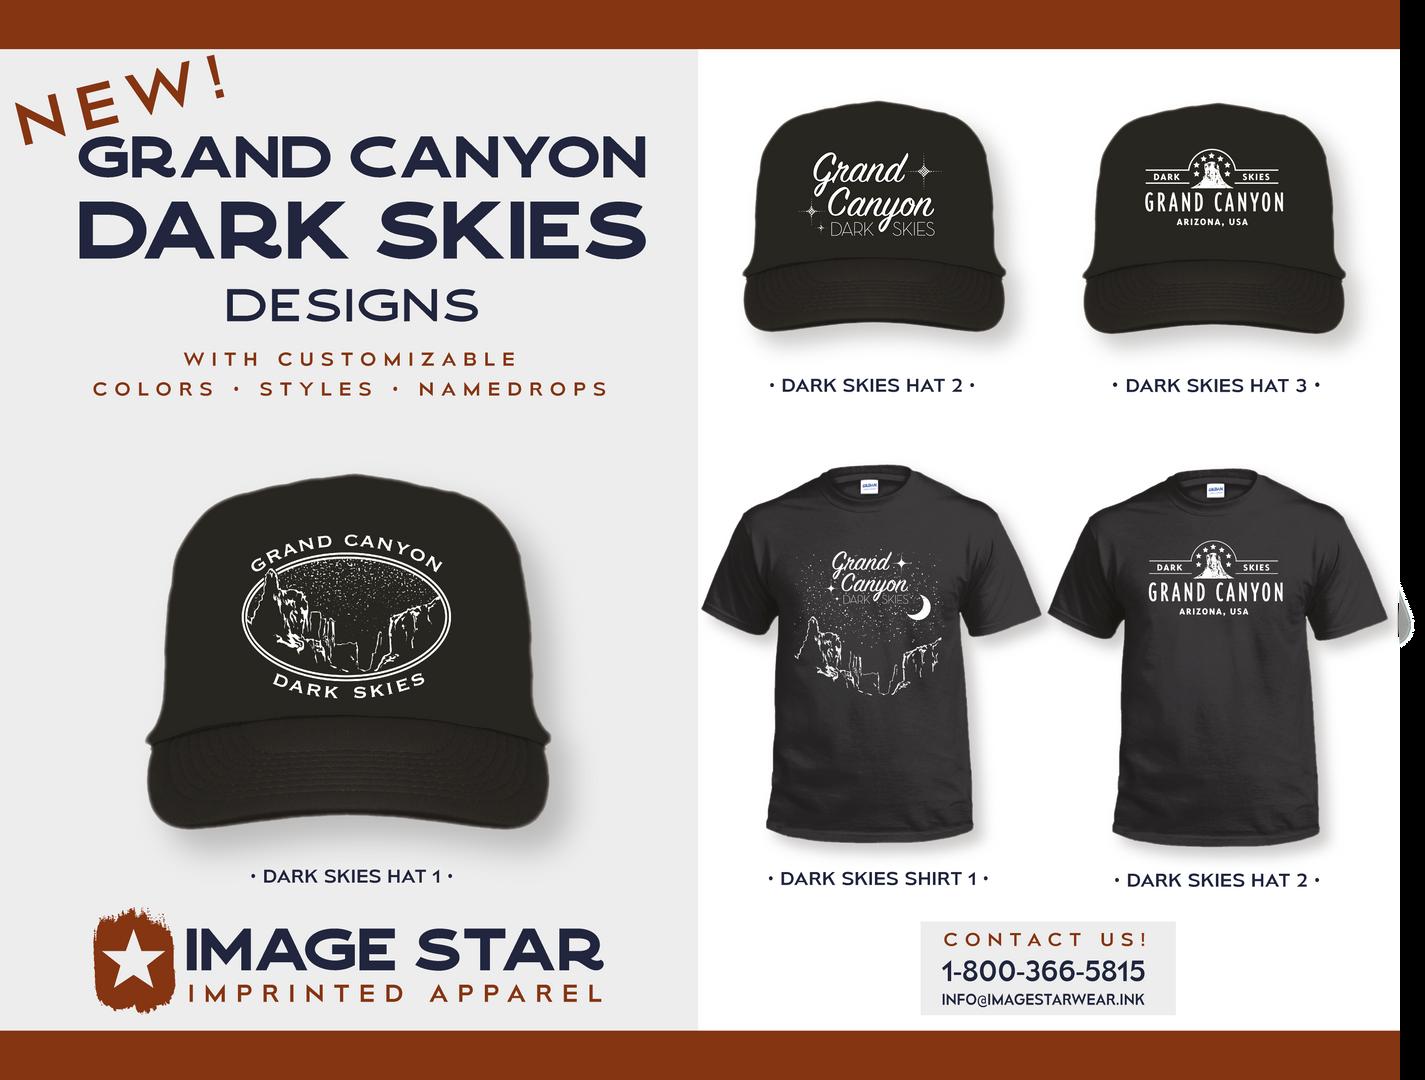 Grand Canyon Dark Skies Designs